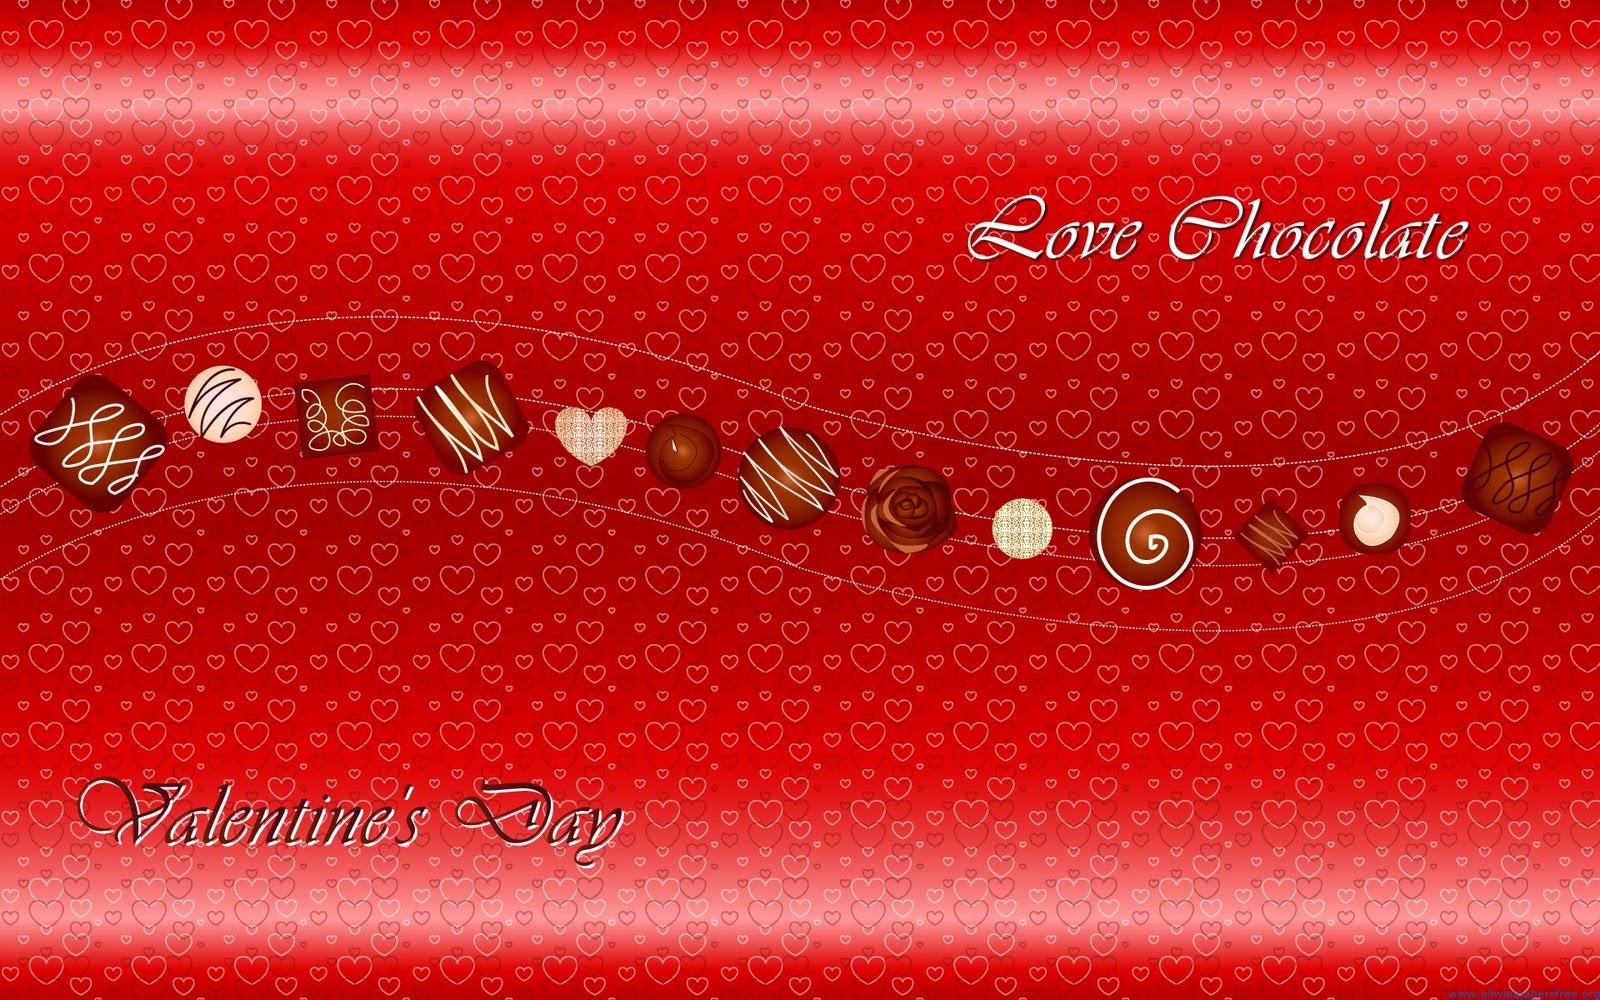 http://2.bp.blogspot.com/-Pn-z-cJekRQ/Tyo9gCQZXmI/AAAAAAAABy0/DnznrHEmX1g/s1600/Beautiful+Valentine%2527s+Day+HD+Widescreen+Wallpapers+%252841%2529.jpg